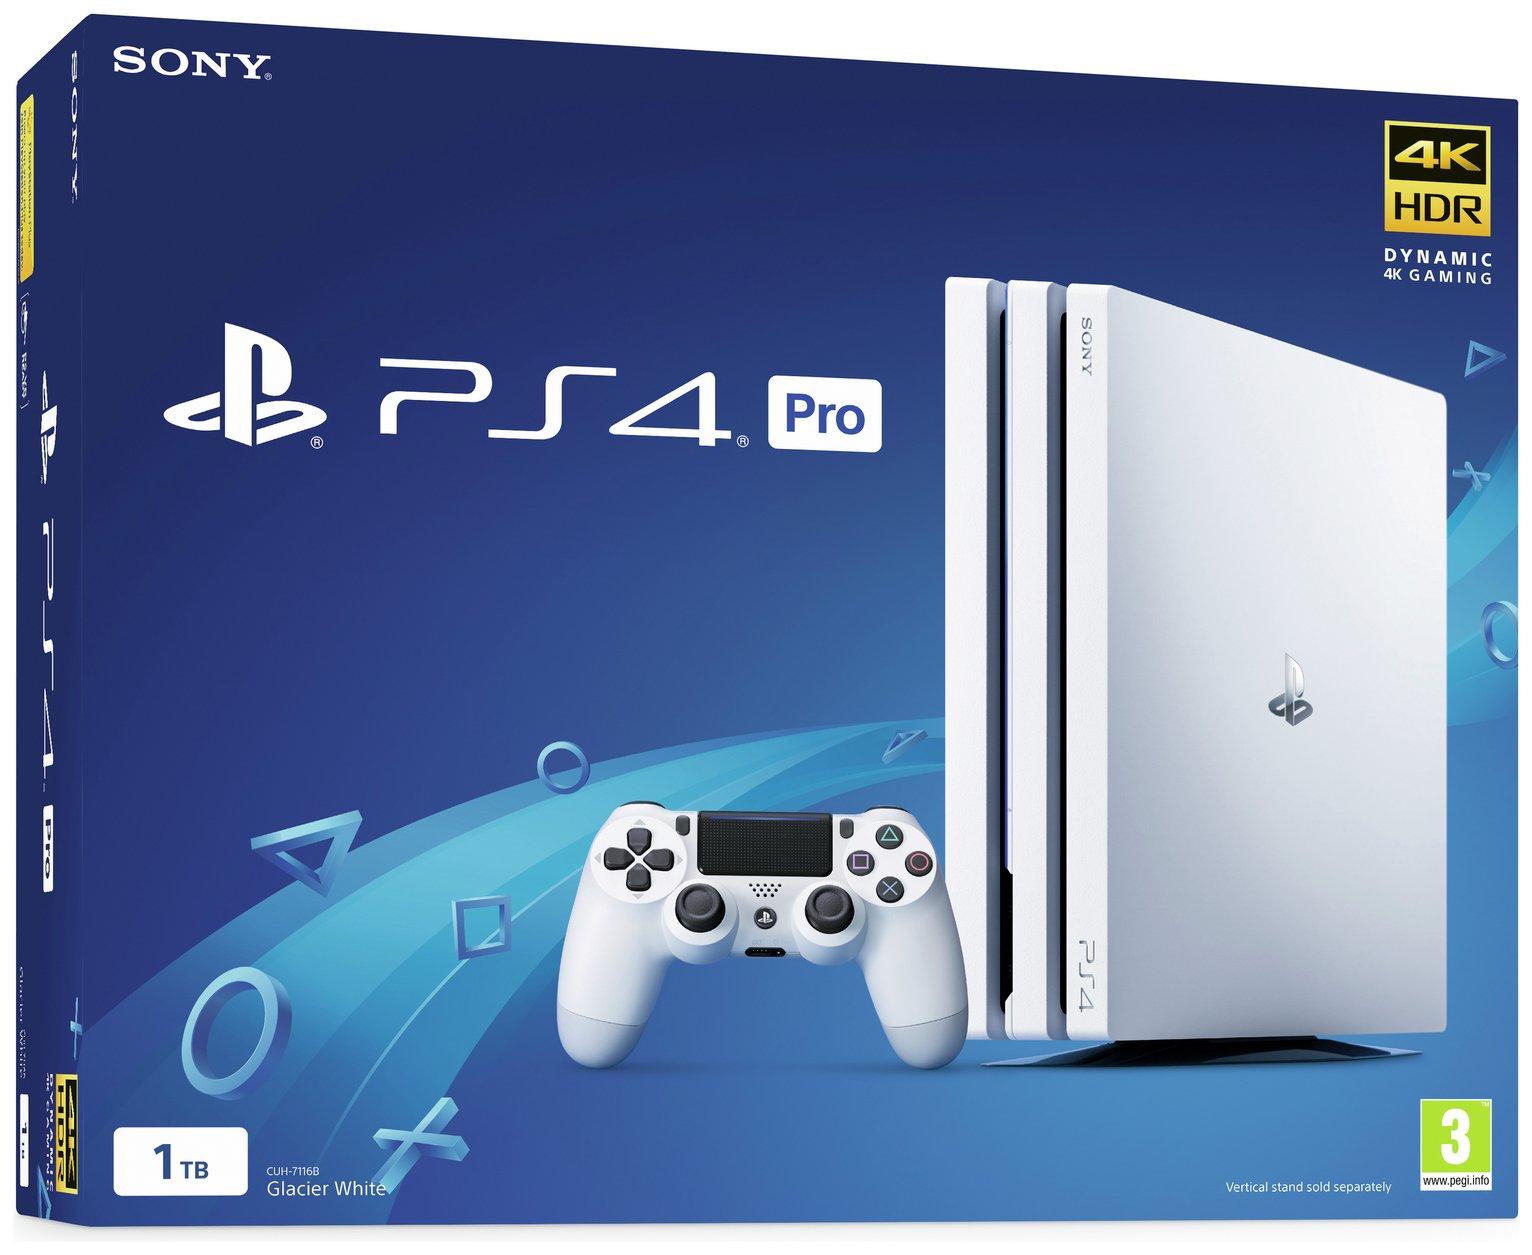 'Sony Ps4 Pro 1tb Console - White